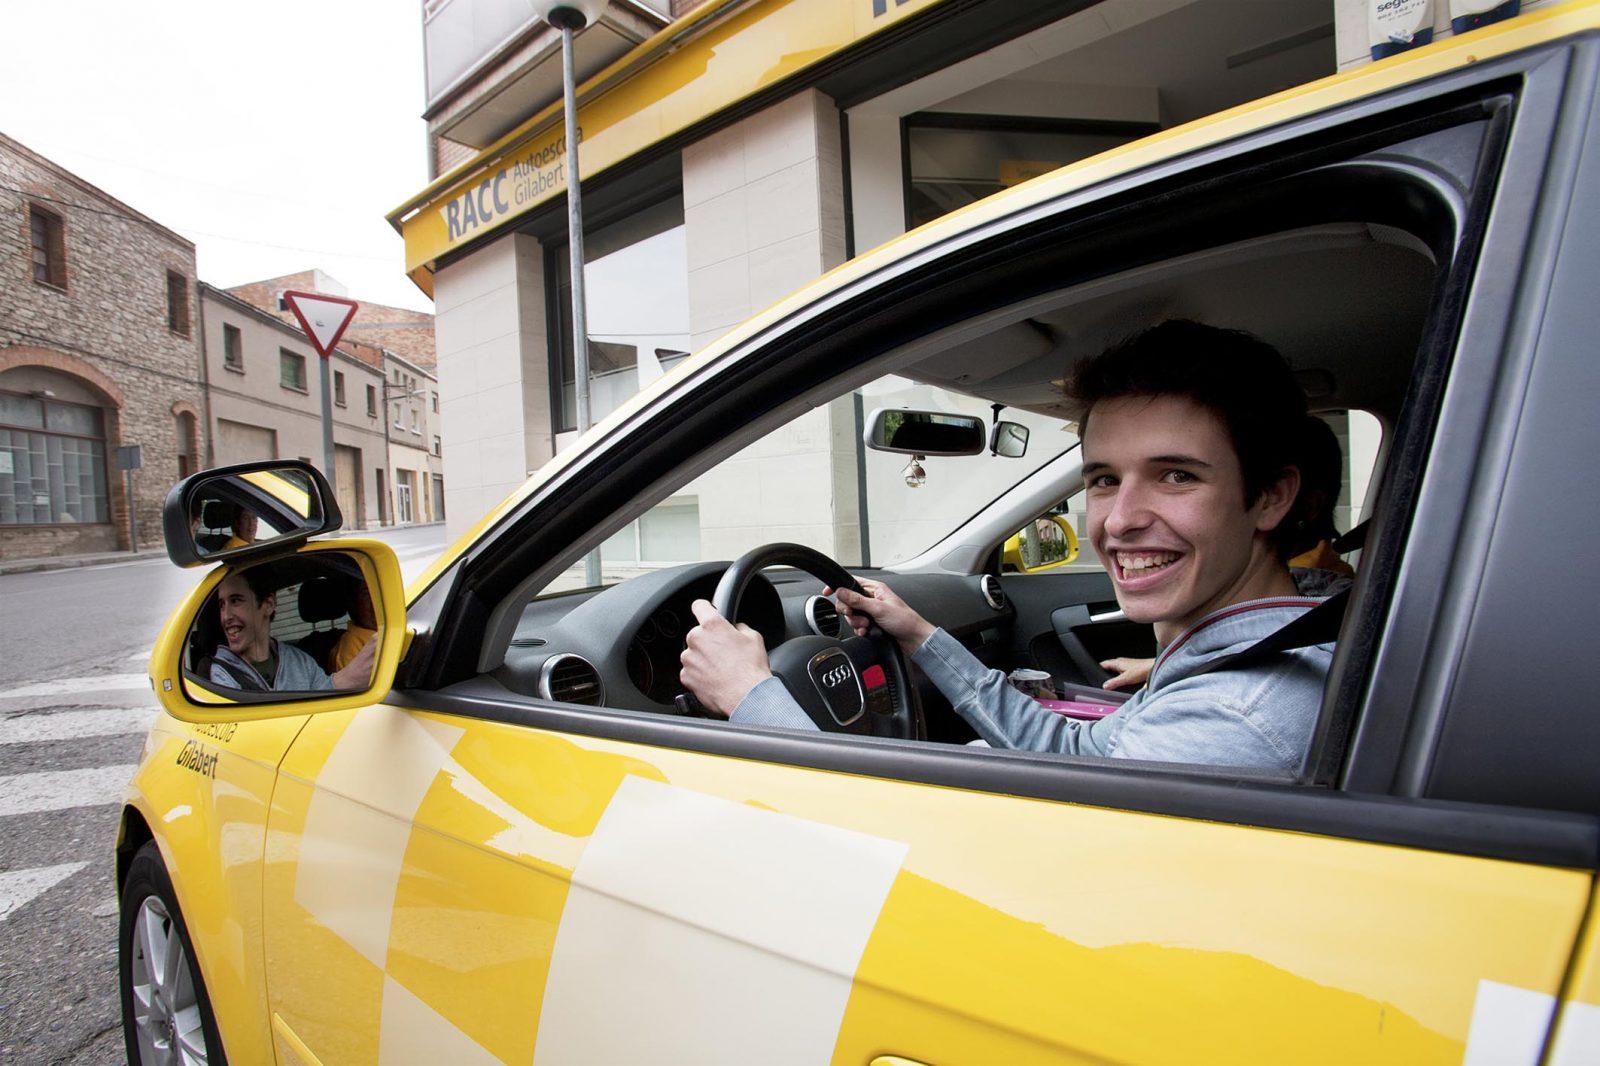 Alex Marquez Racc